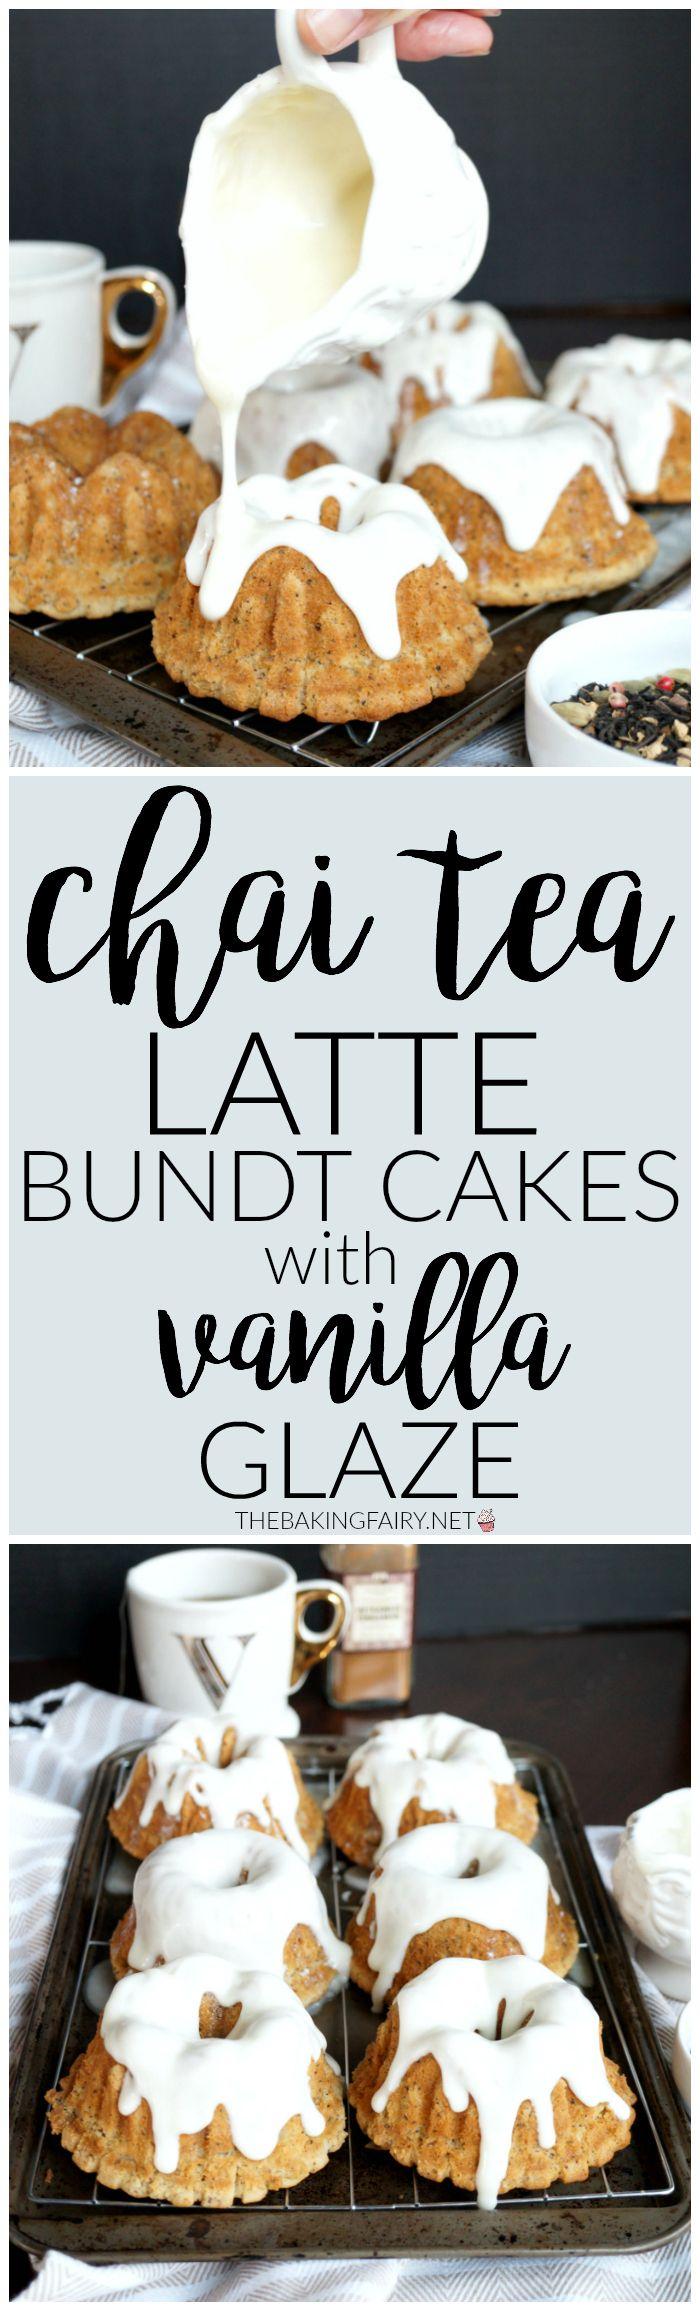 chai tea latte bundt cakes with vanilla glaze   The Baking Fairy